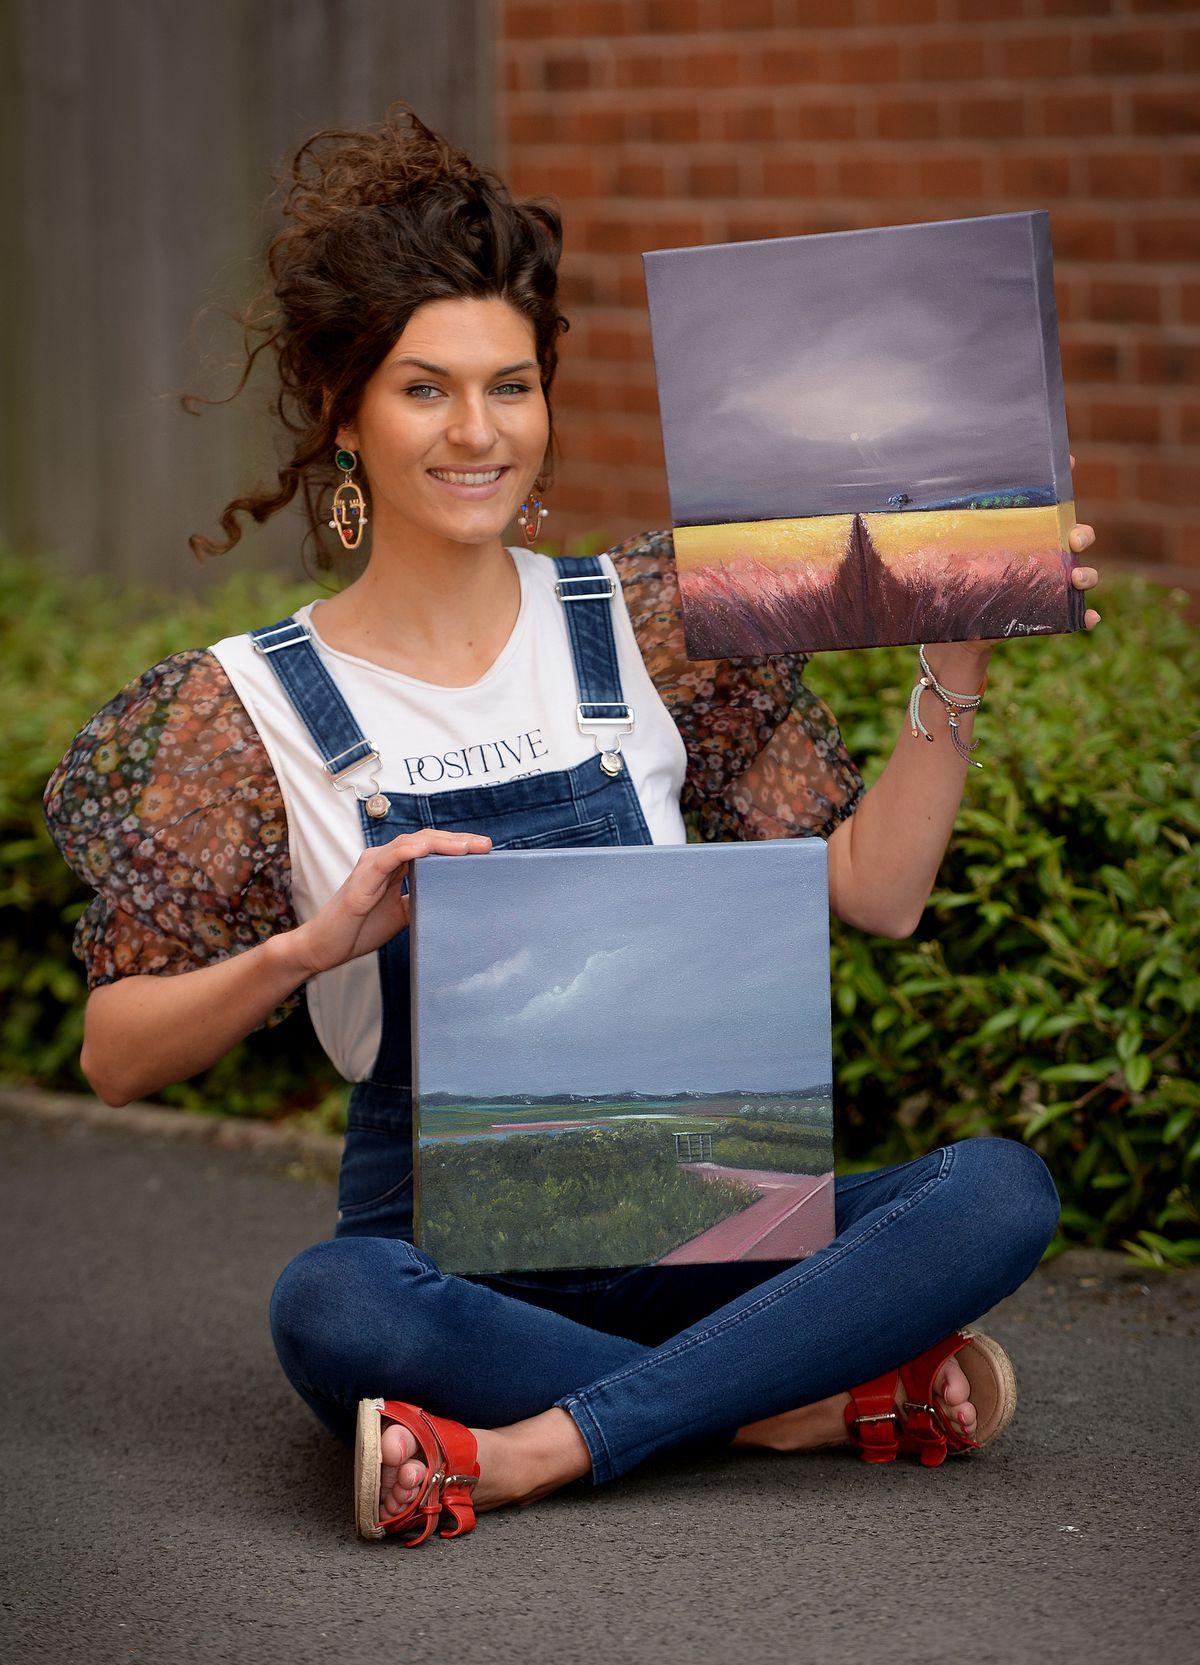 Shifnal artist Stephanie Potts announces the winners of the art raffle